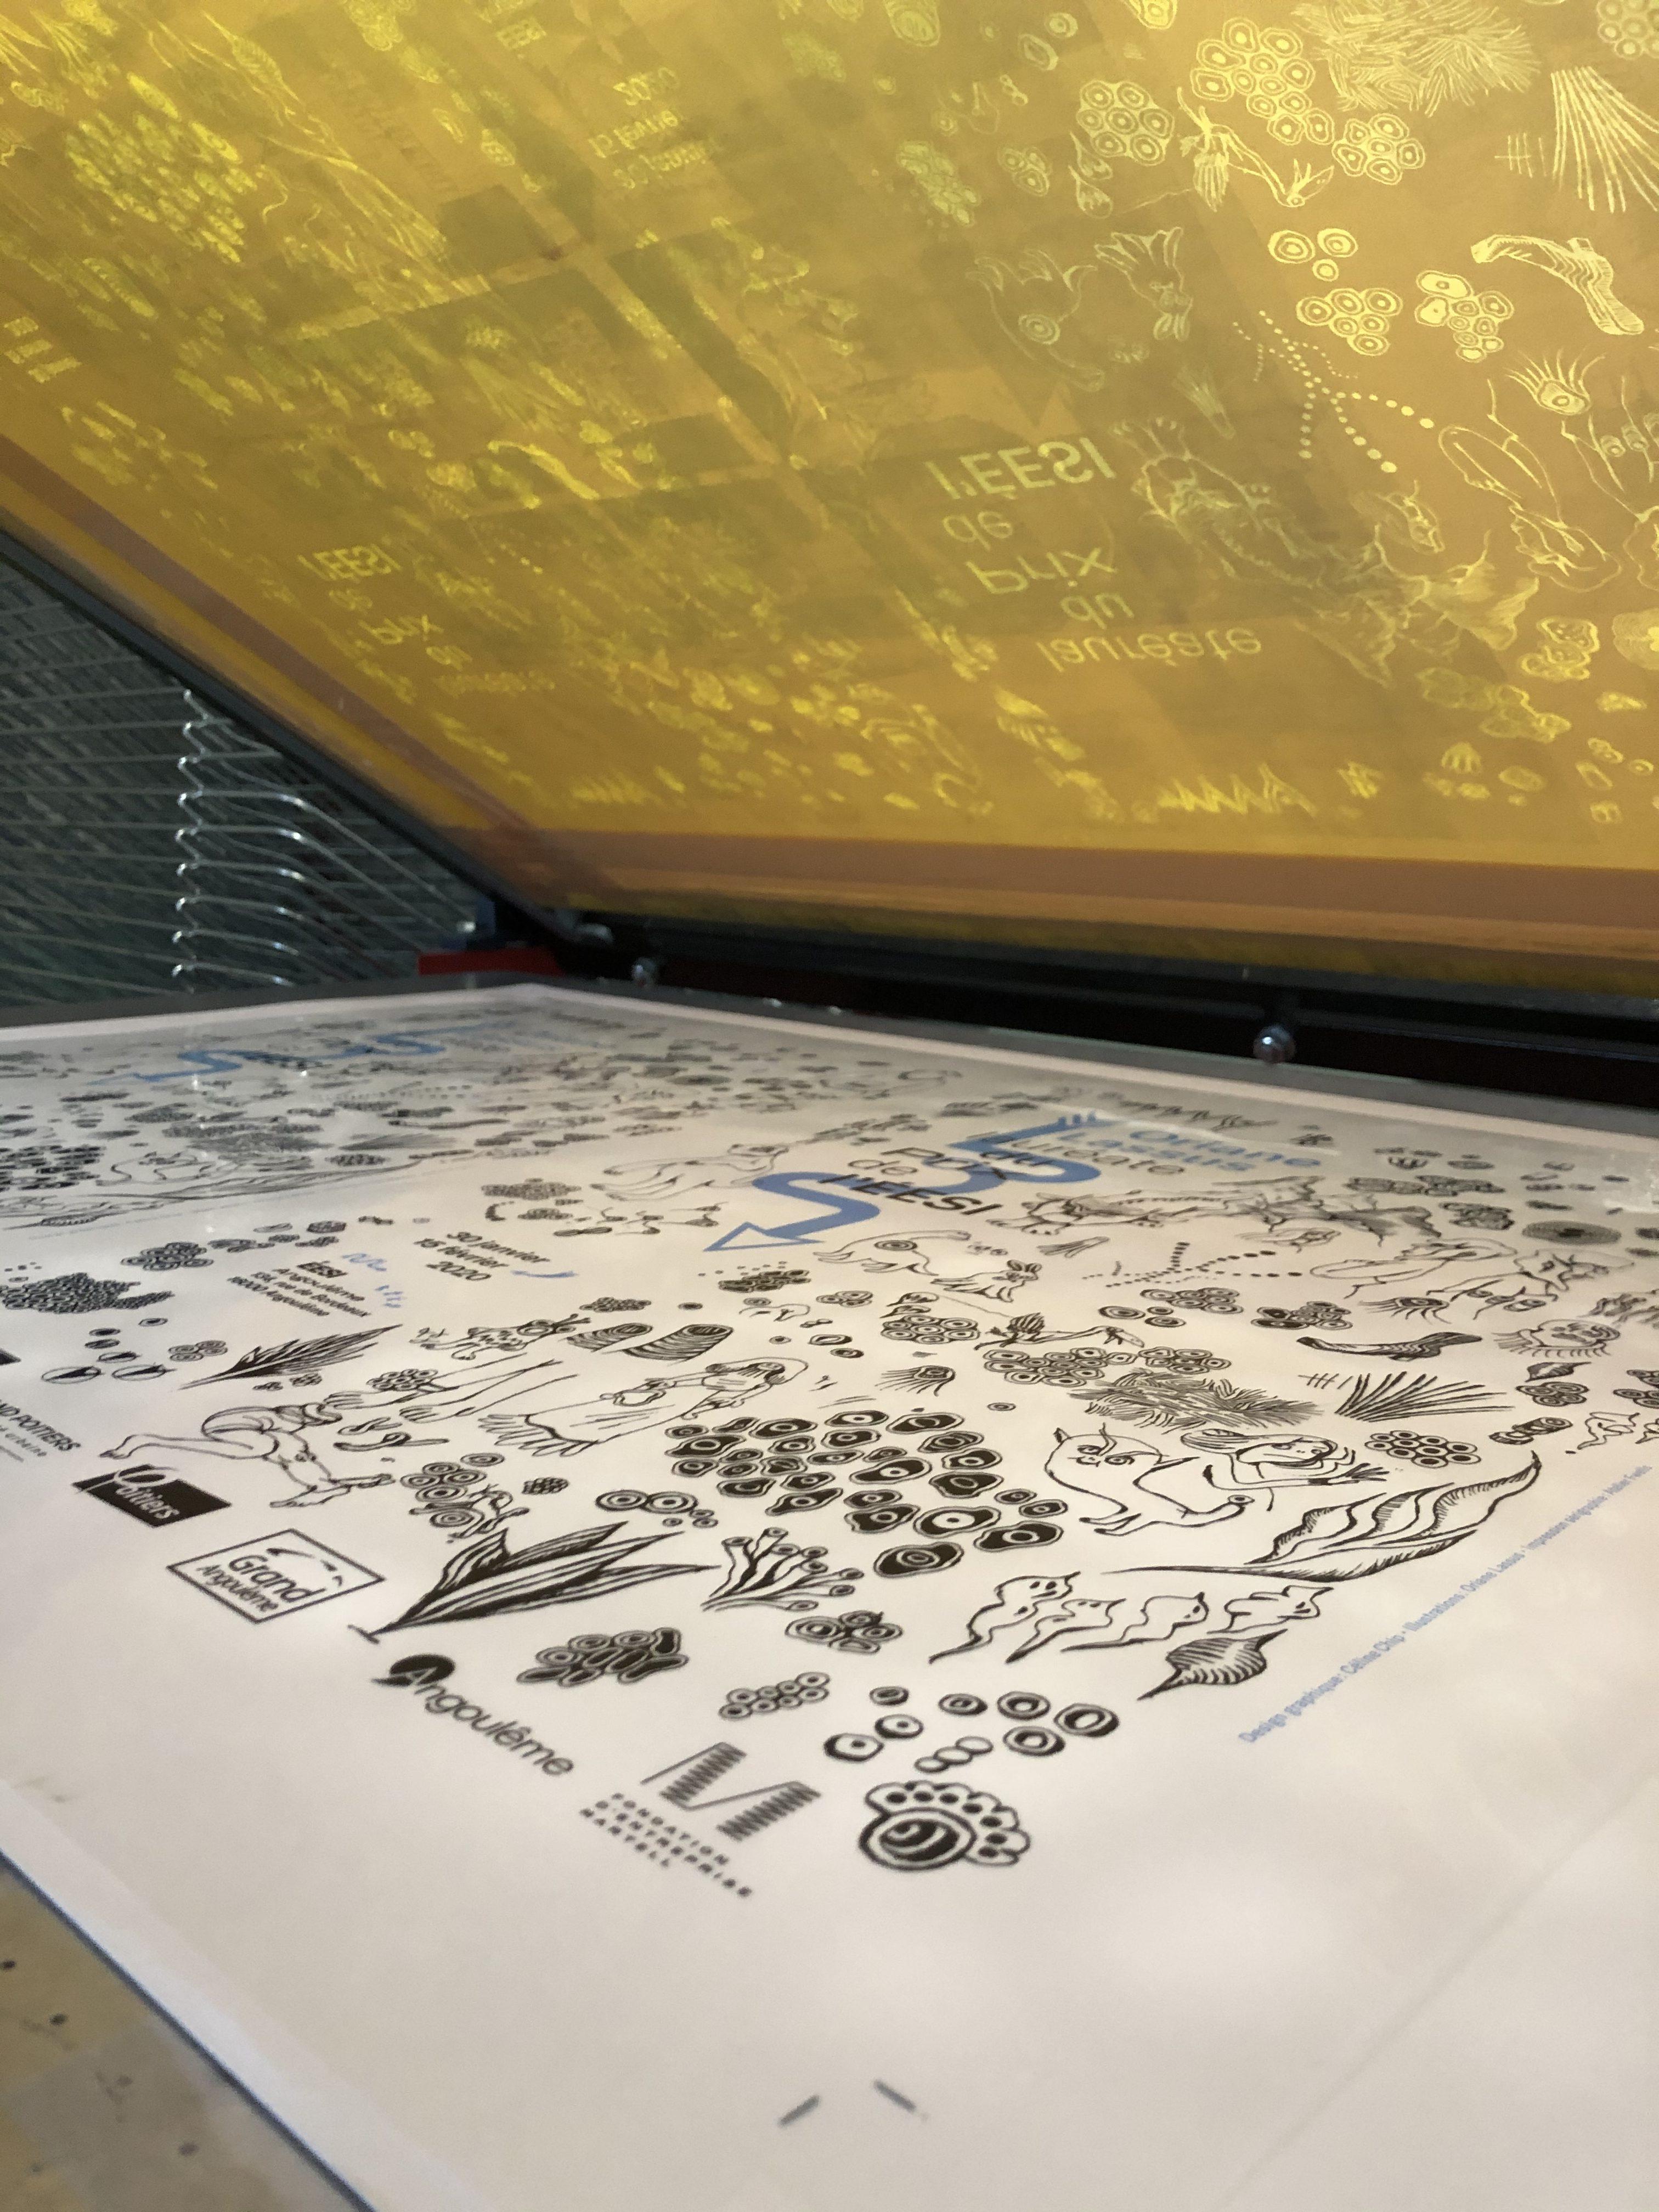 impression-serigraphie-paris-atelier-fwells-munken